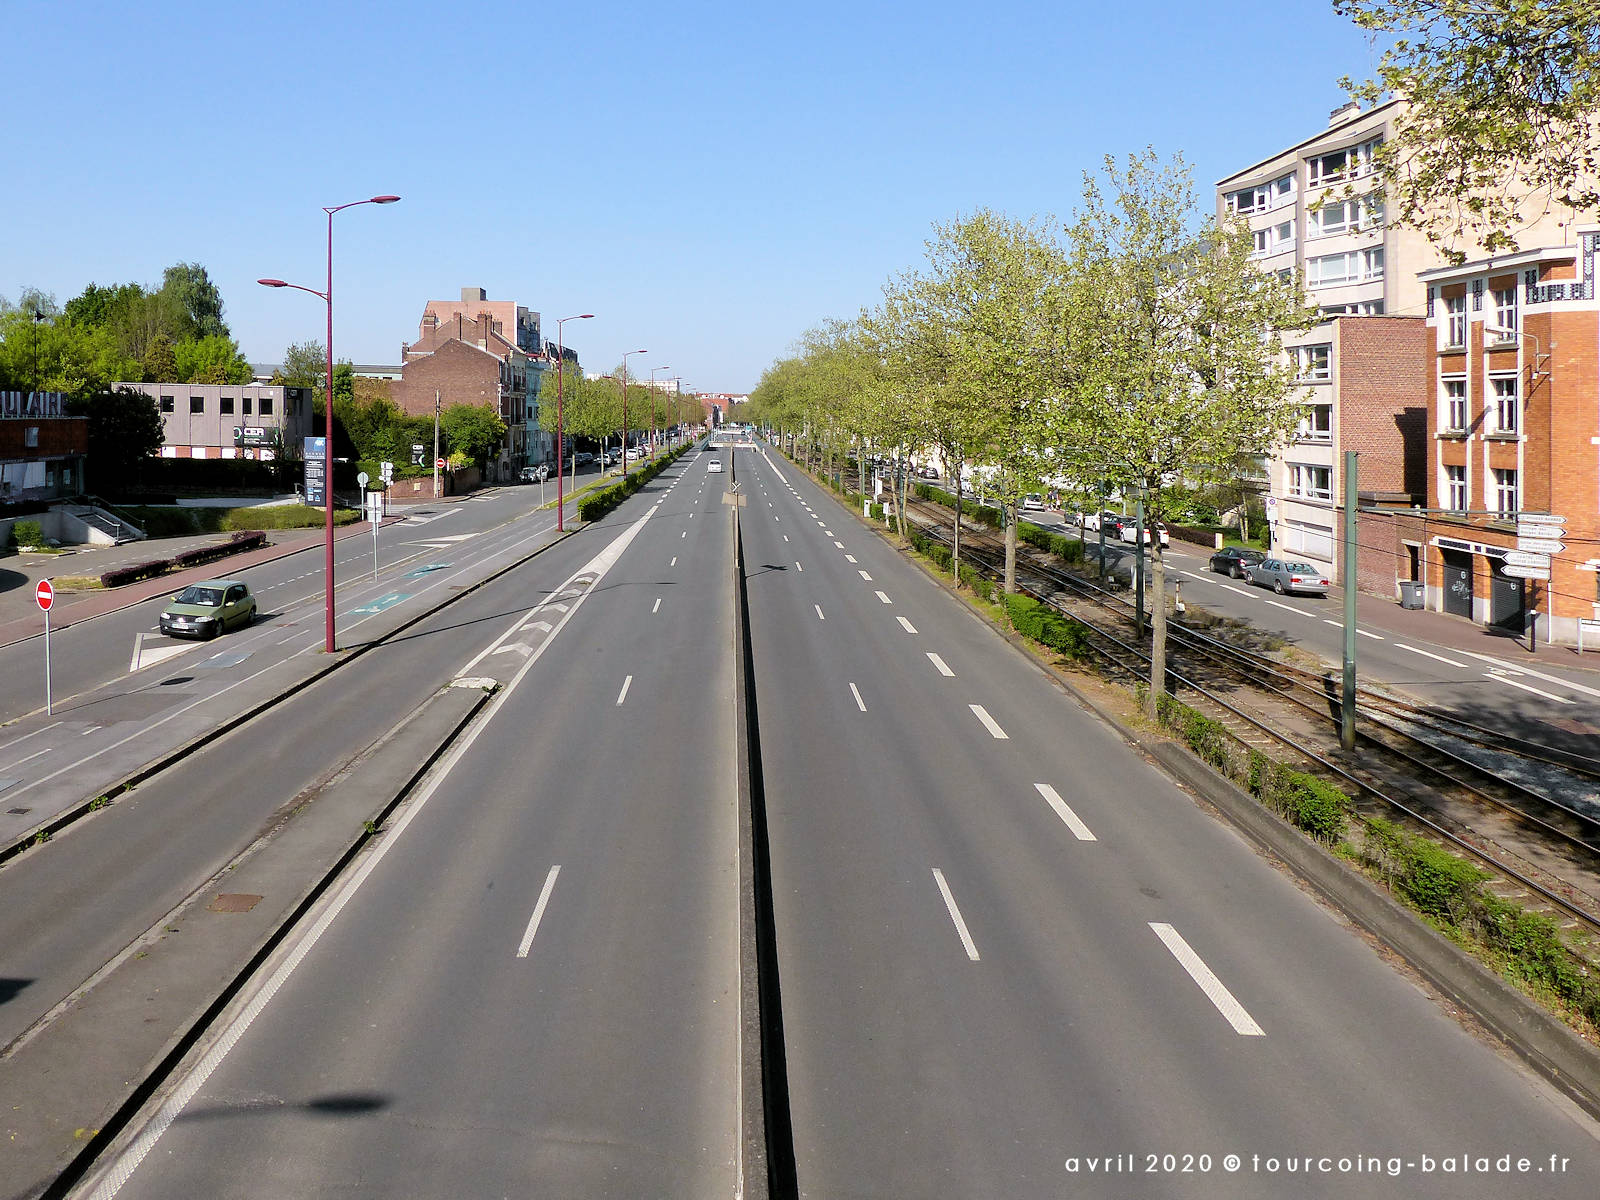 Grand Boulevard Lille Roubaix Tourcoing, 2020